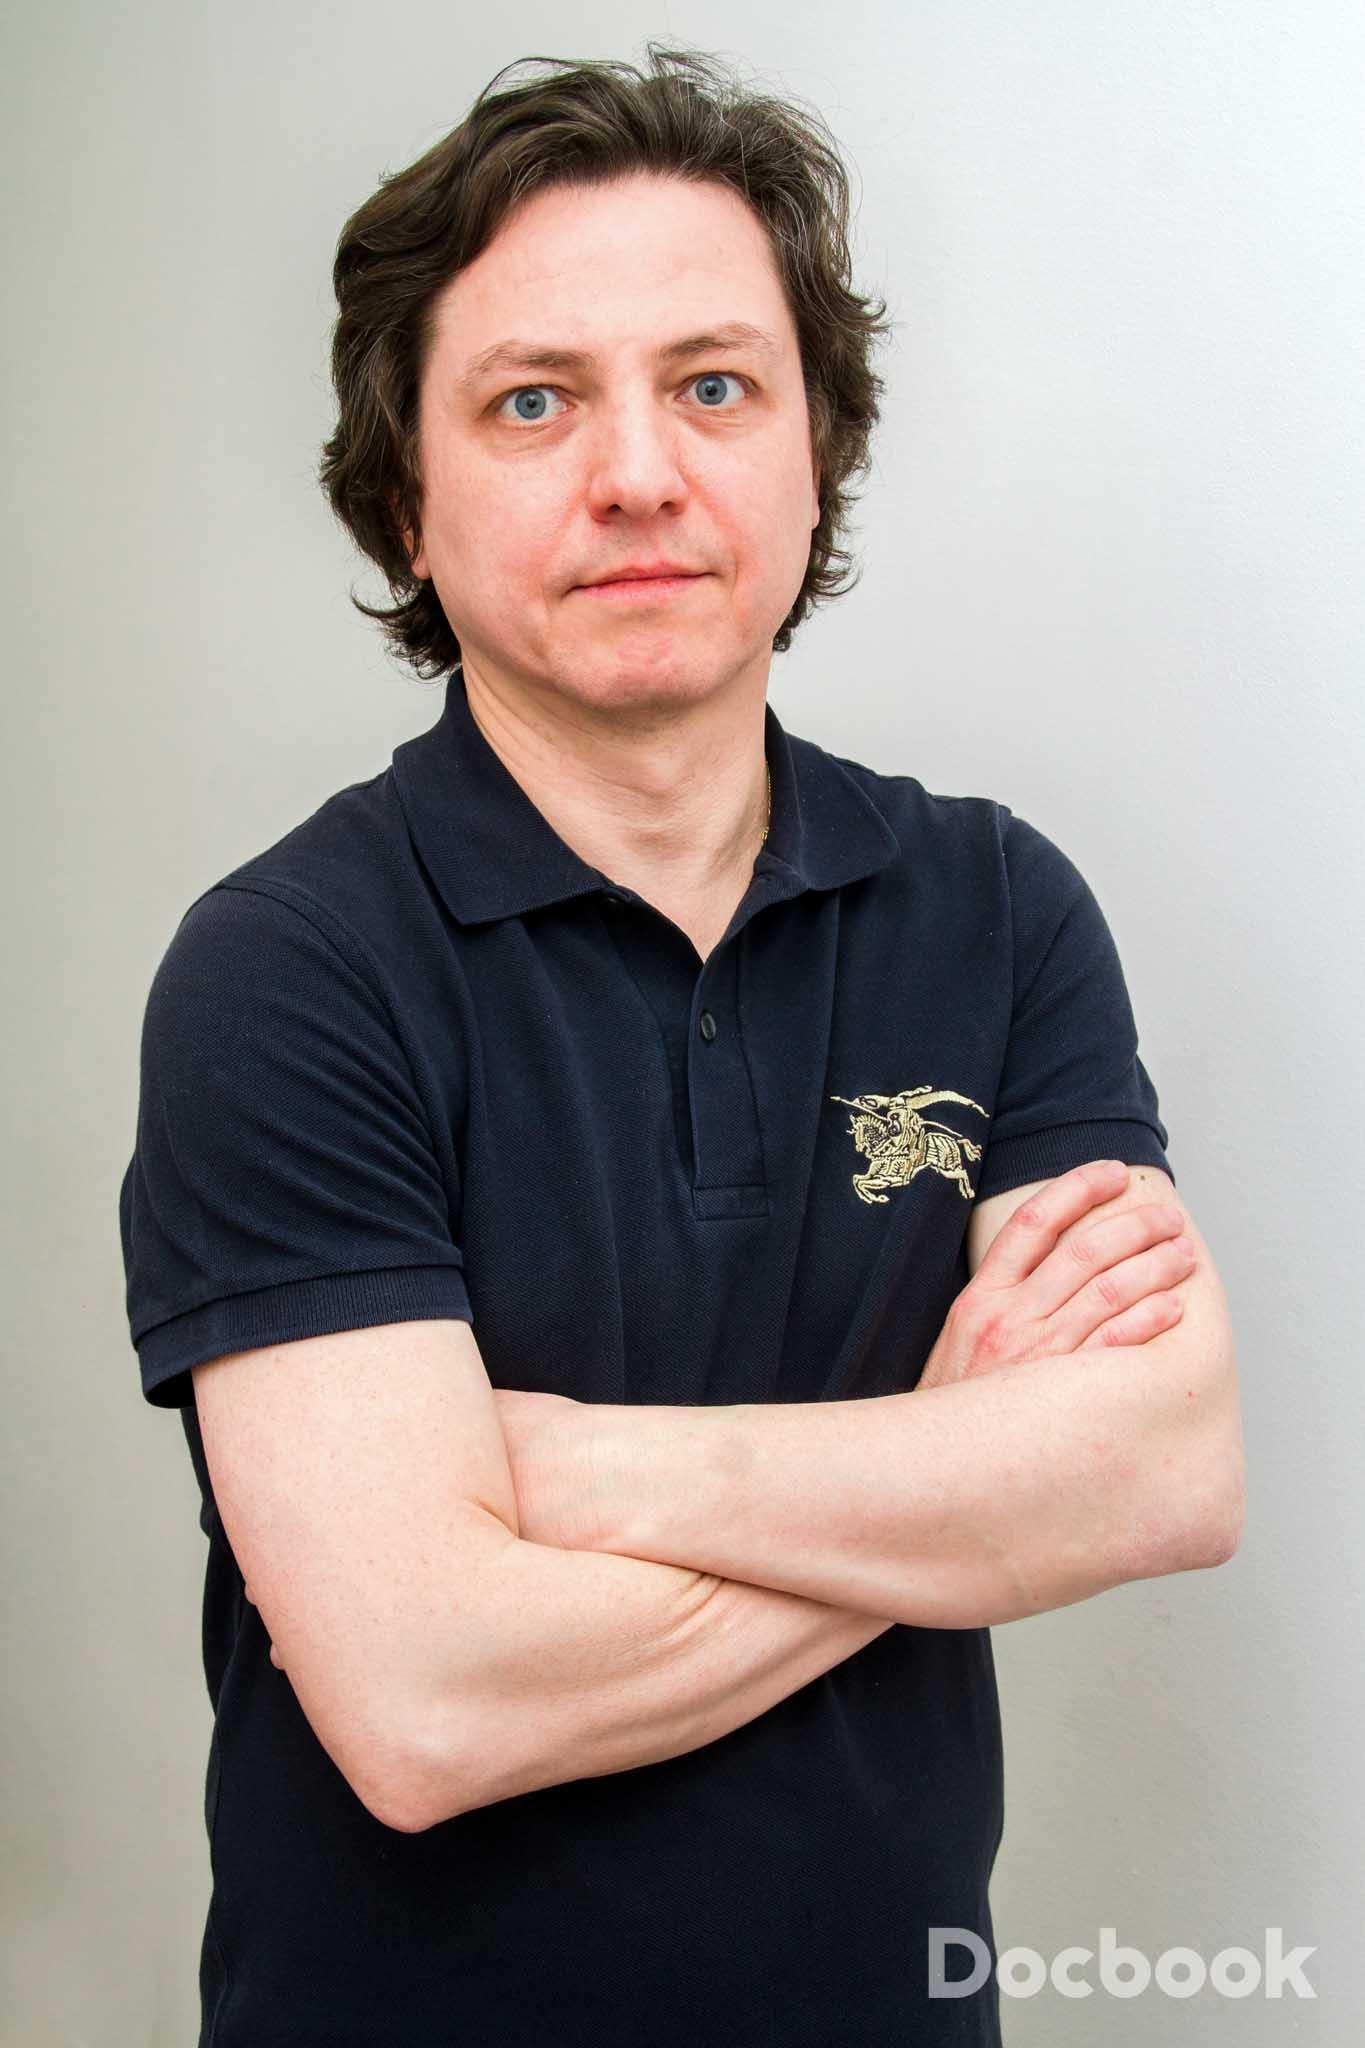 Dr. Alexander Barac